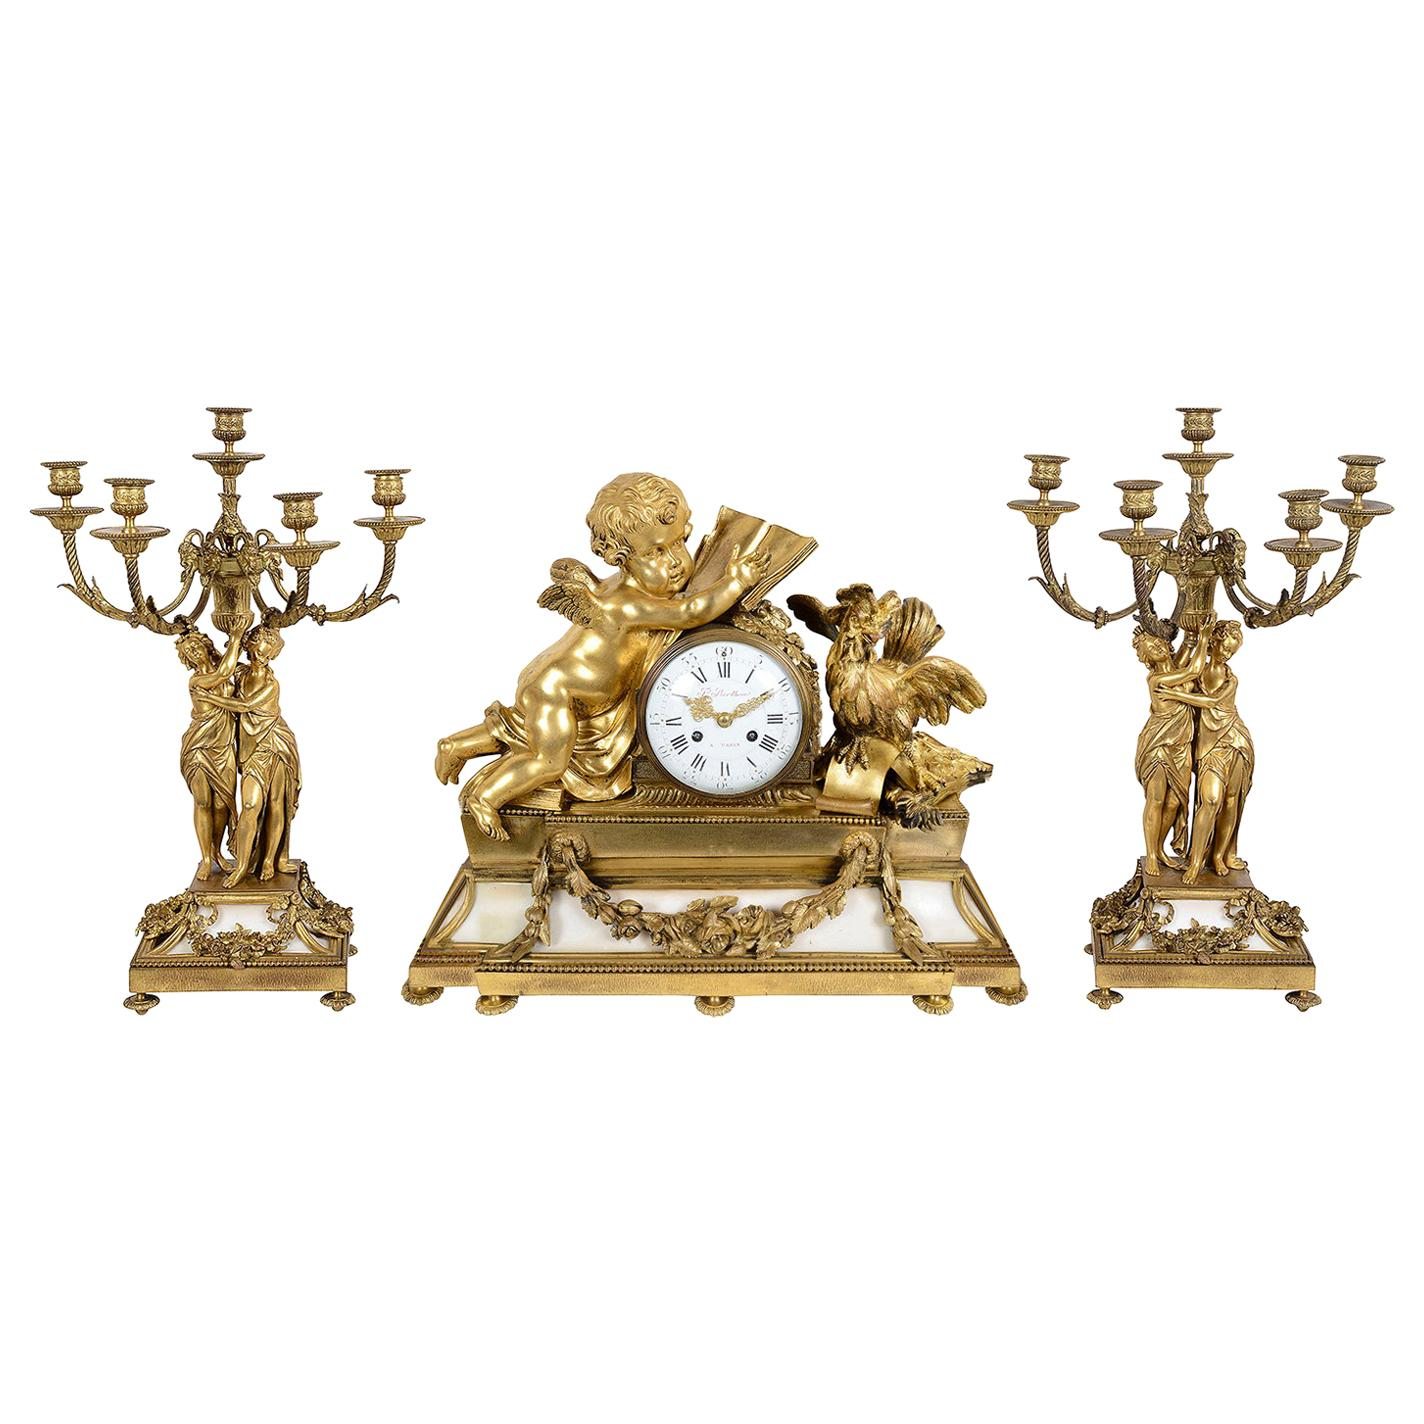 Large Louis XVI Style Ormolu and Marble Clock Set